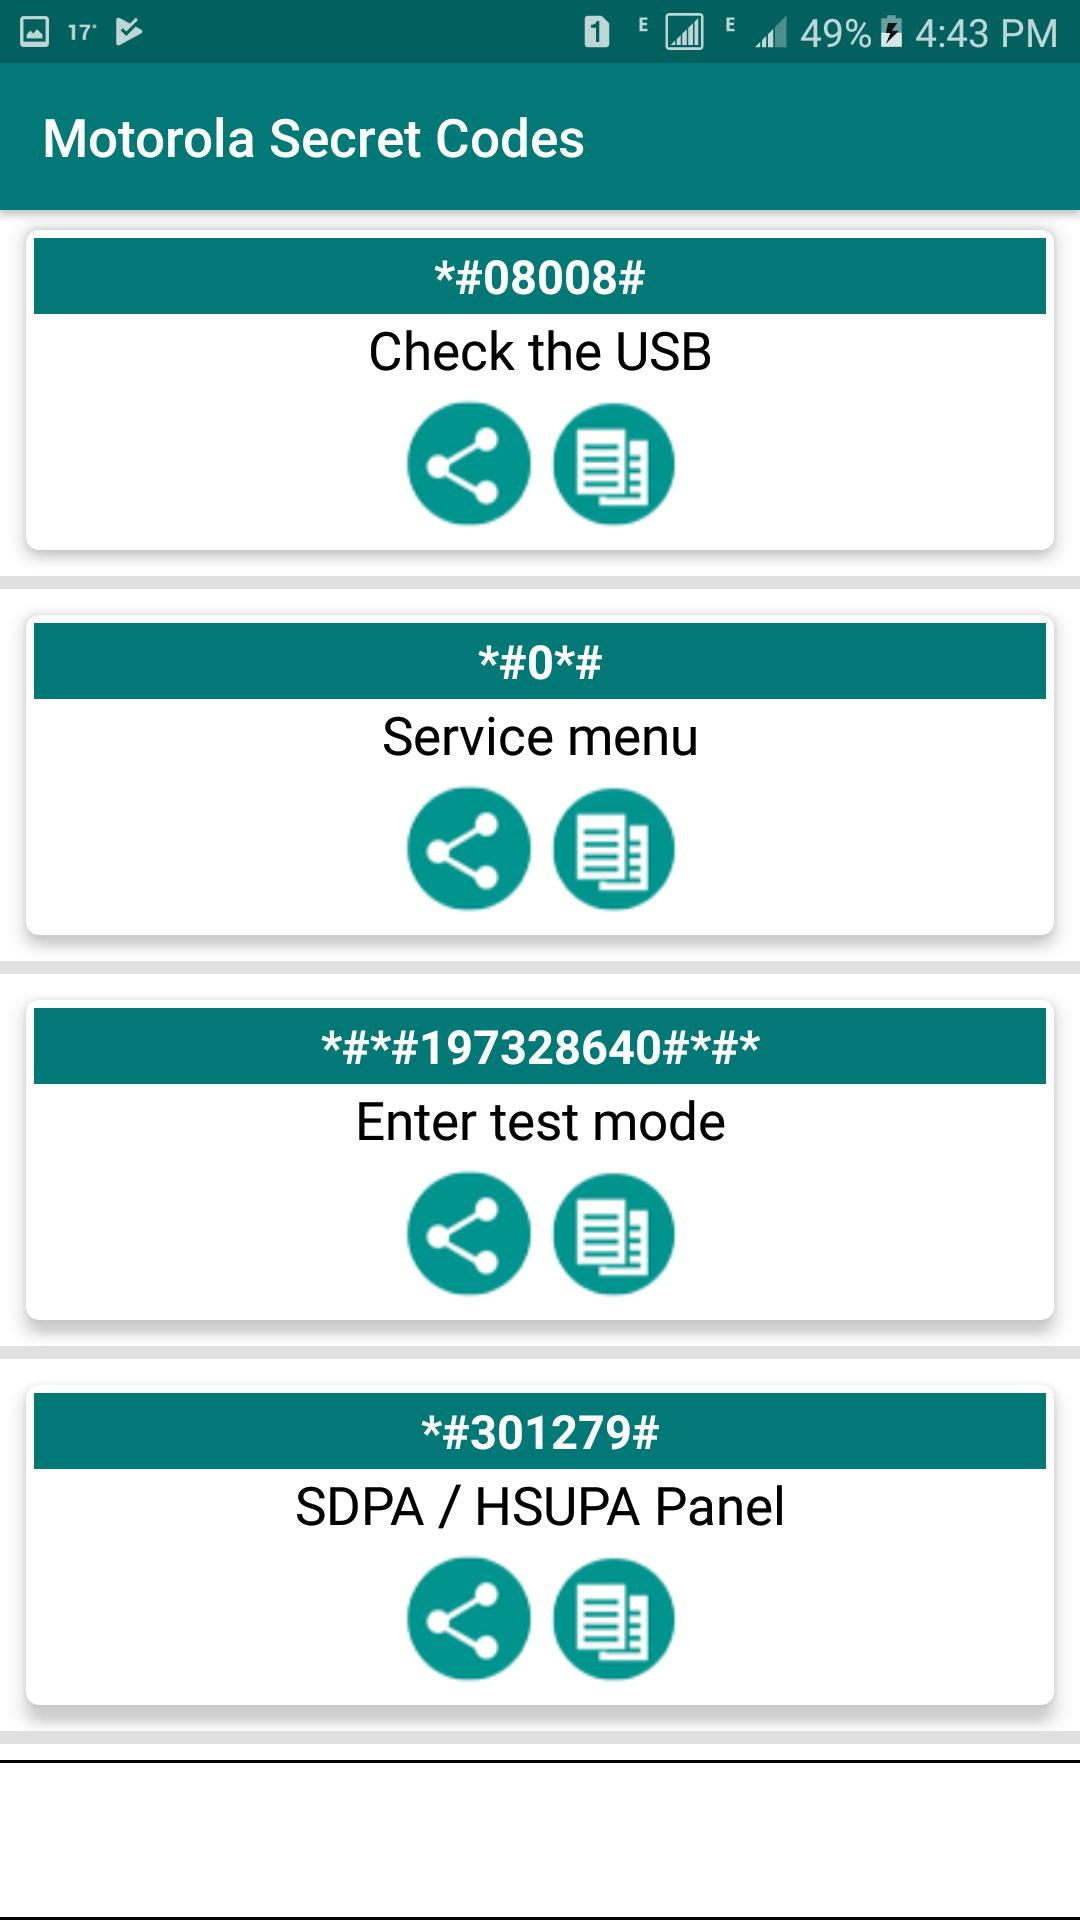 Secret Codes of Motorola 2019: for Android - APK Download